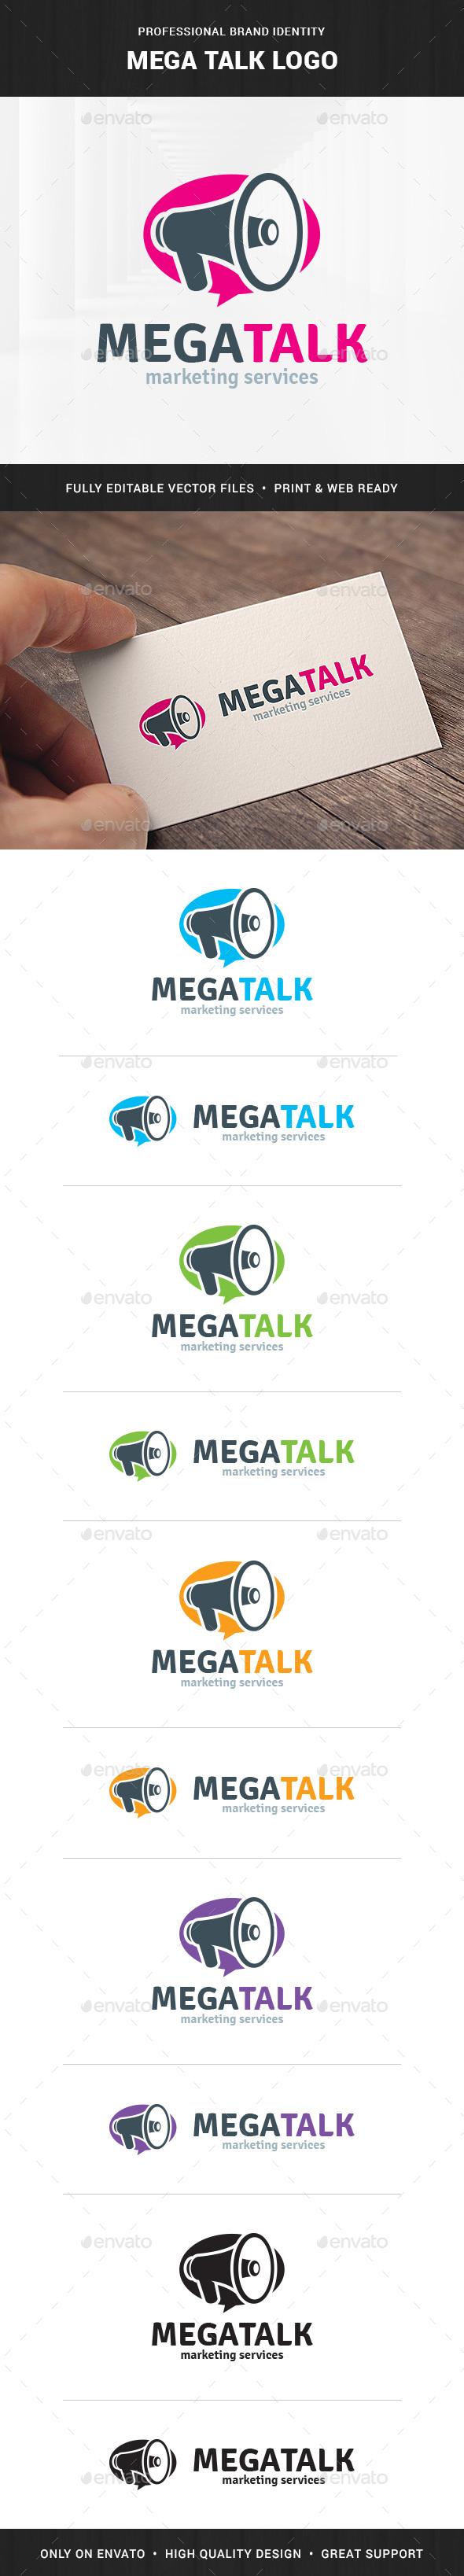 Mega Talk - Megaphone Logo Template - Objects Logo Templates